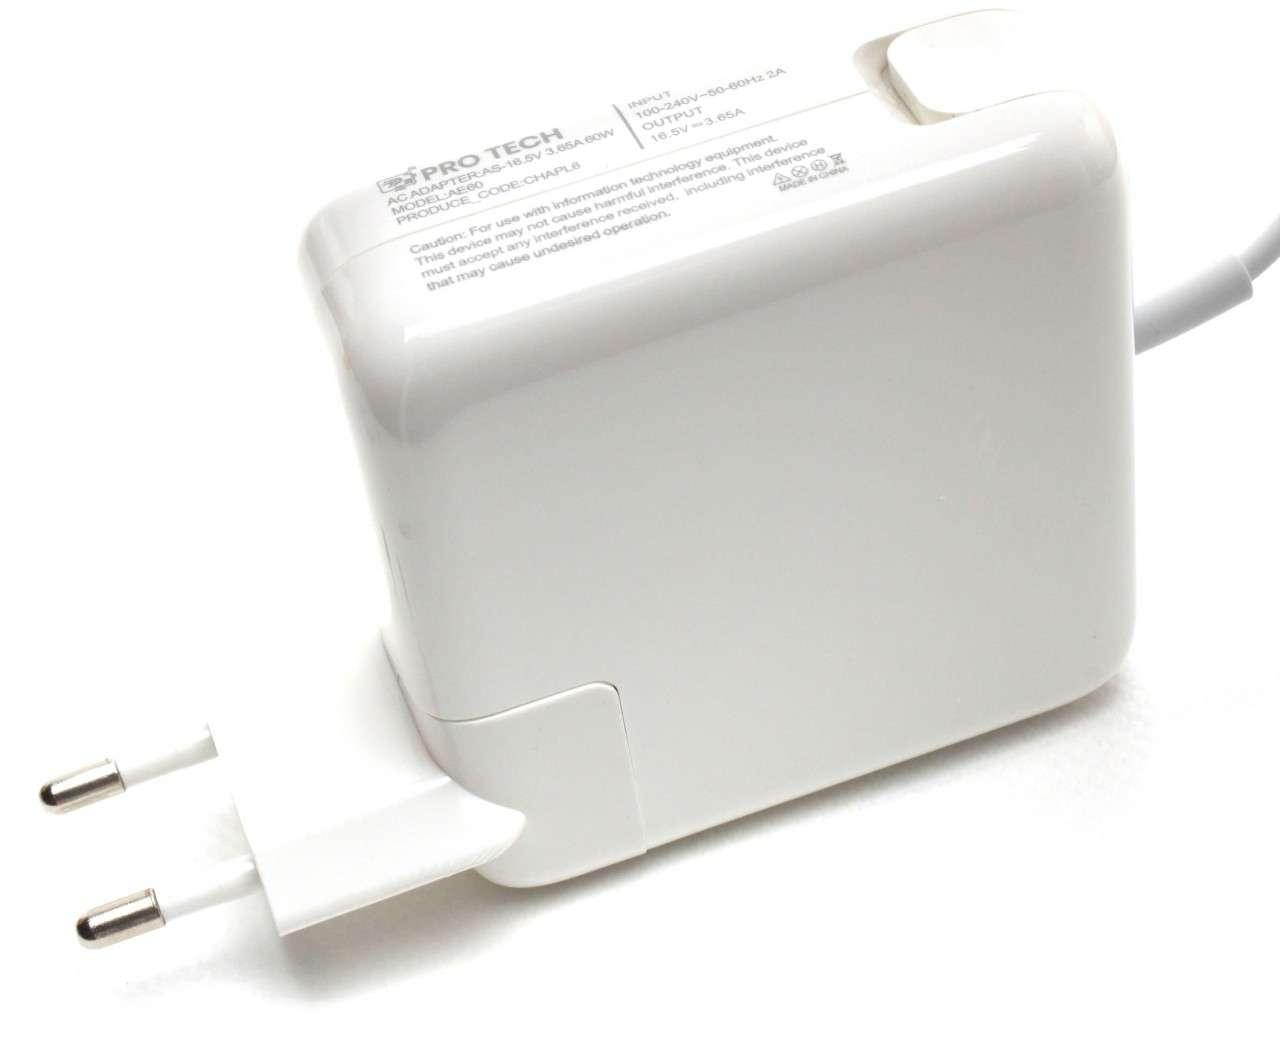 Incarcator Apple MacBook 13.3 inch MA699LLA Replacement imagine powerlaptop.ro 2021